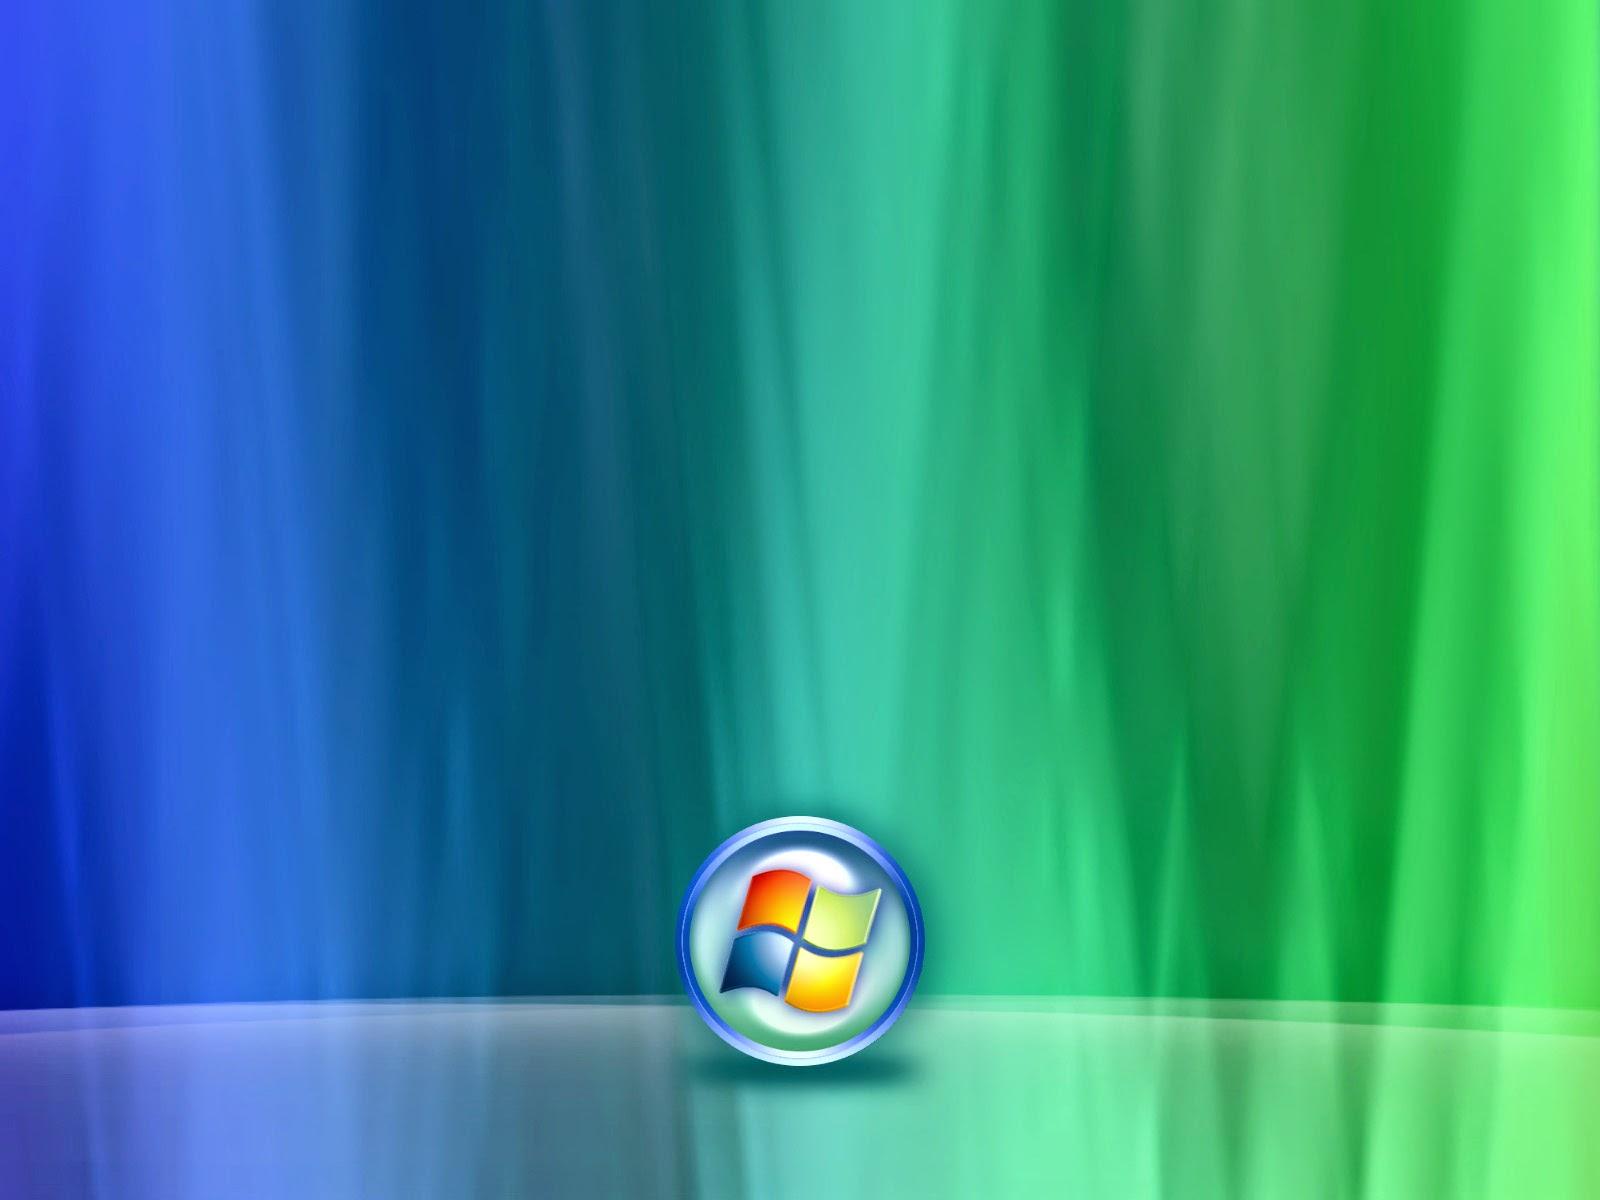 Windows 7 Computer Desktop HD Wallpaper Download